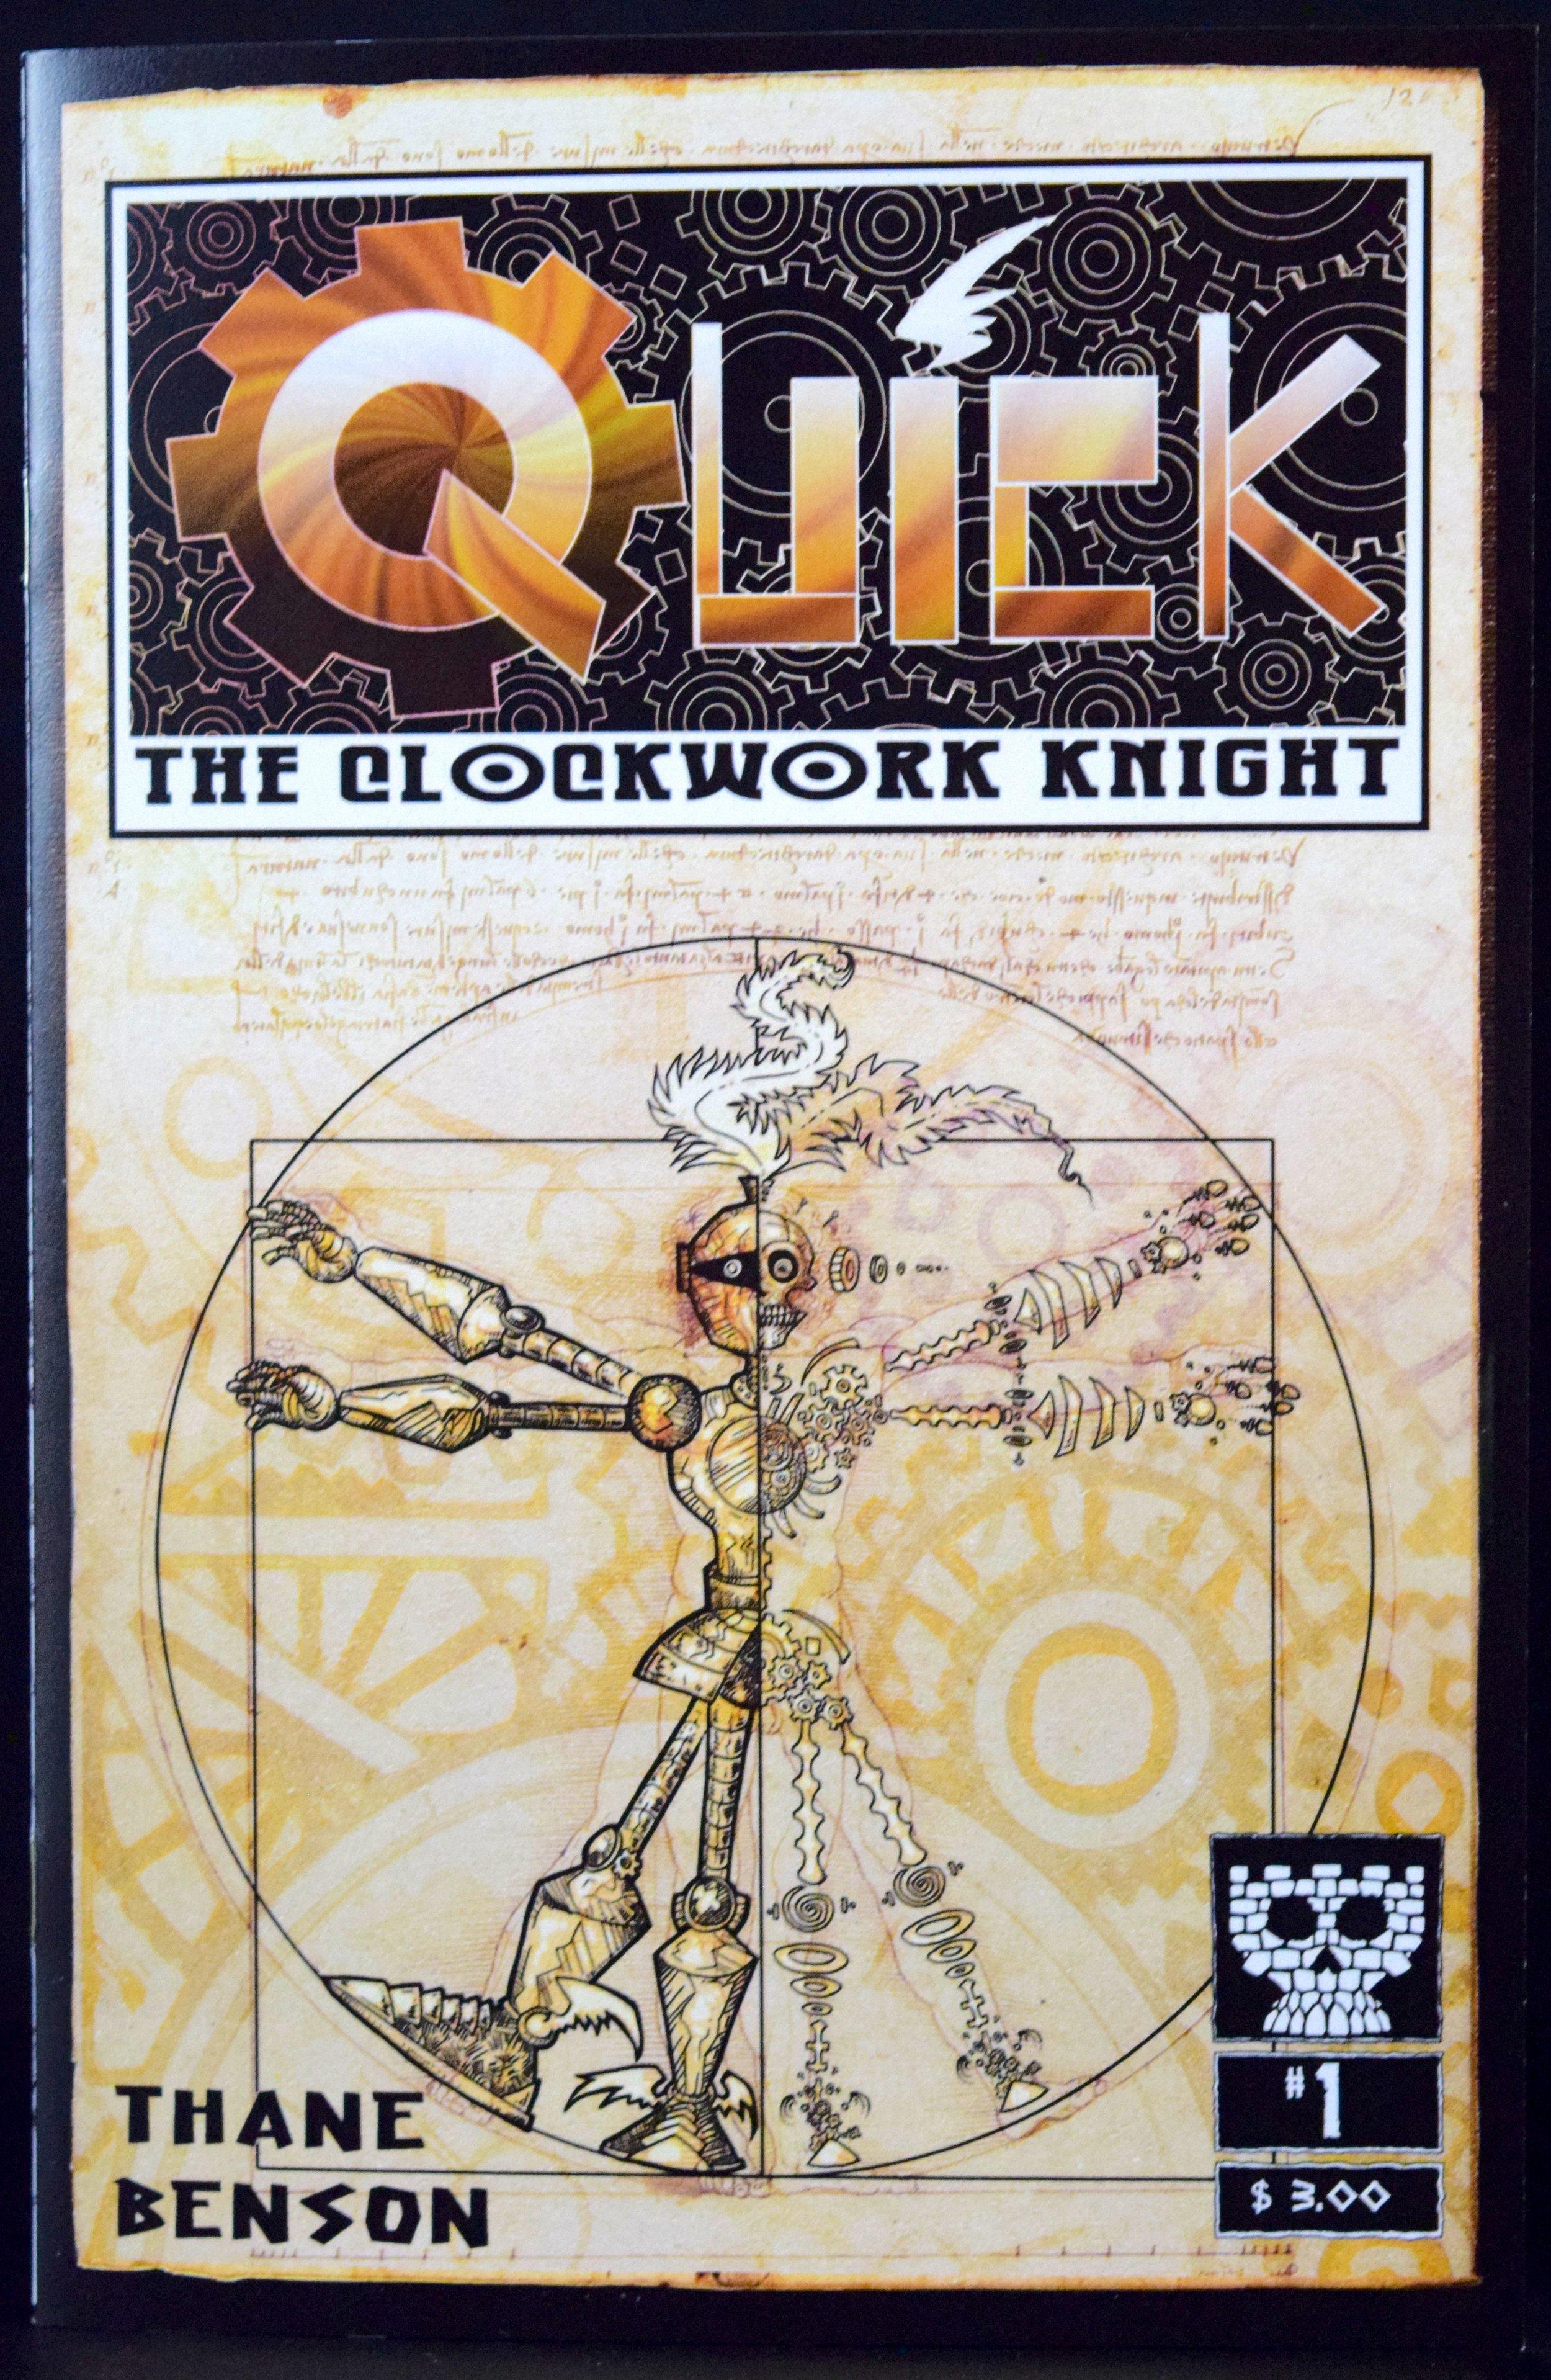 Quick the Clockwork Knight #1  by  Thane Benson .